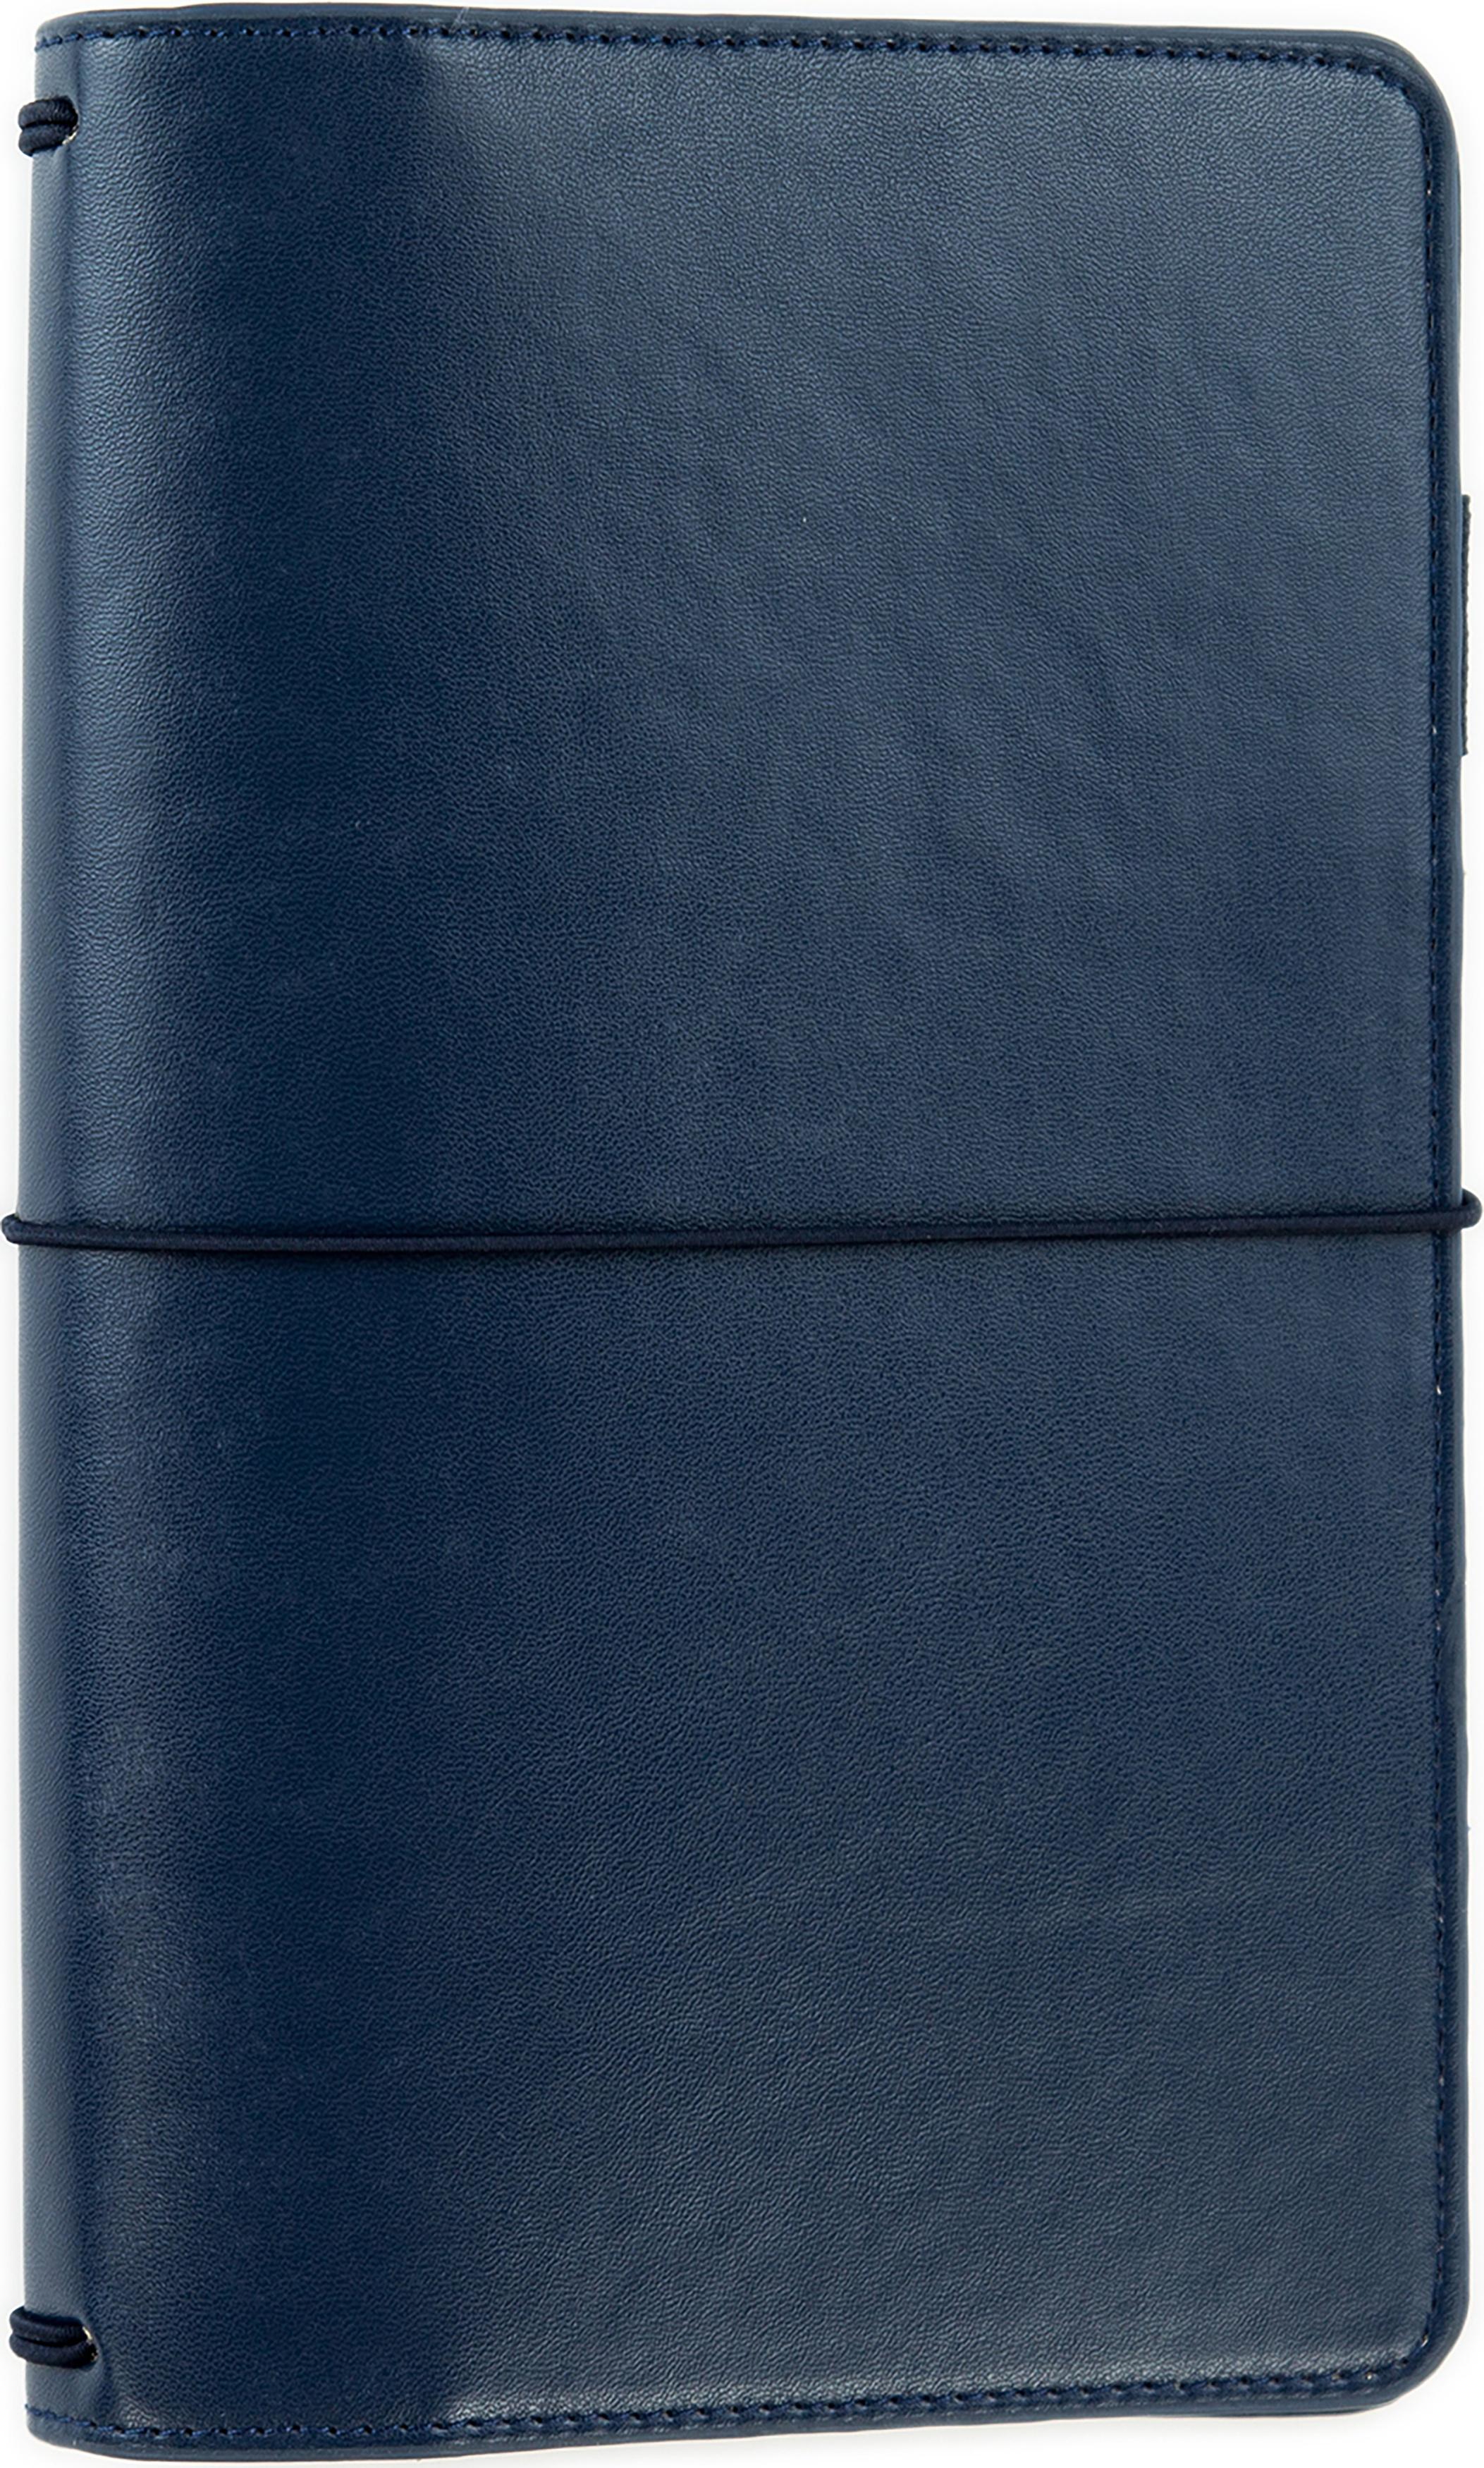 Echo Park - Navy Travelers Notebook